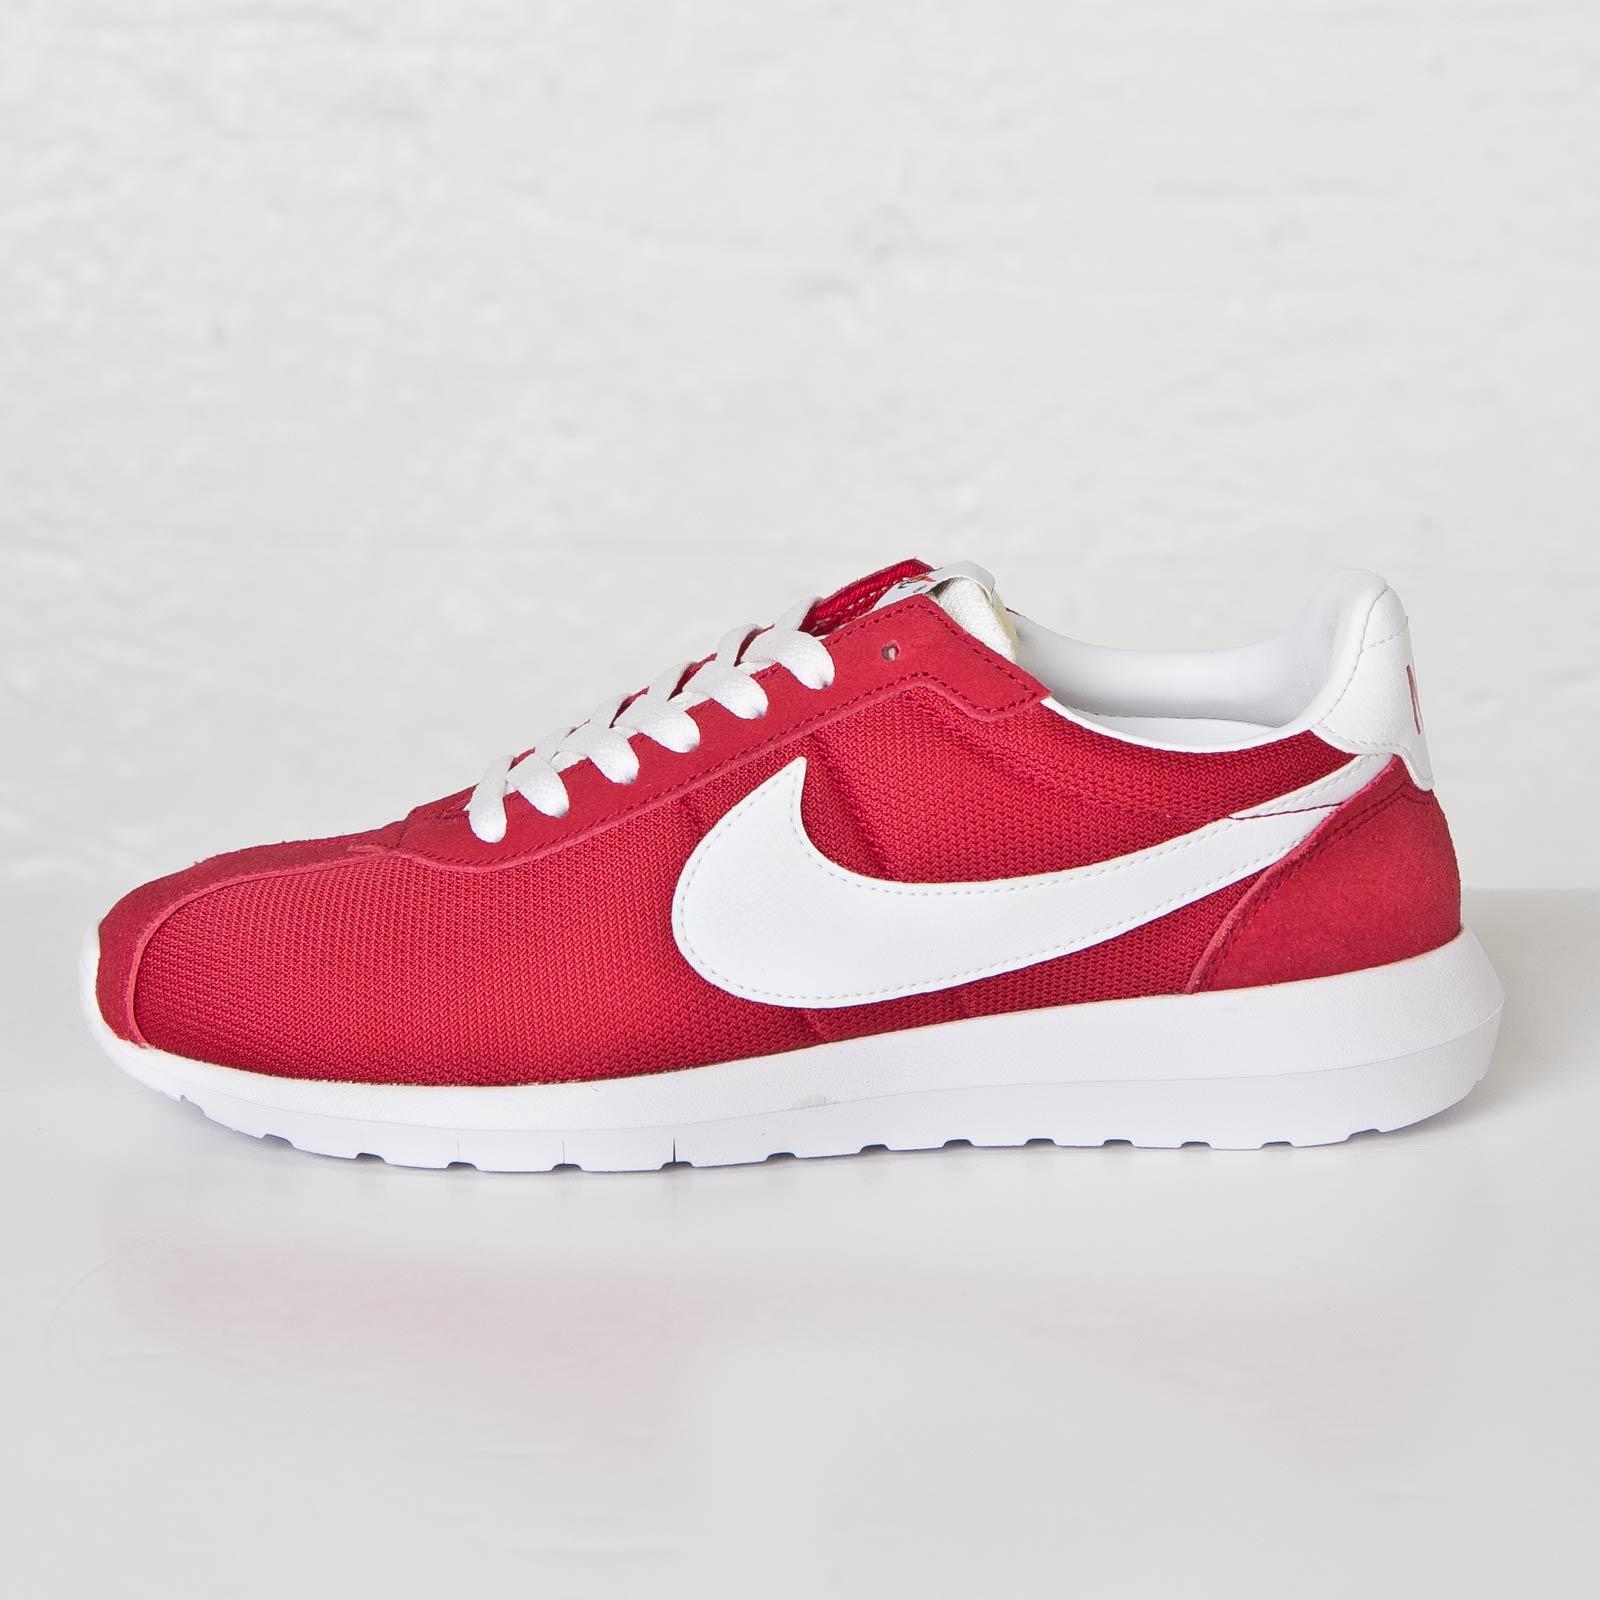 best service 6f76c 28aef Nike Roshe LD-1000 QS - 802022-601 - Sneakersnstuff   sneakers   streetwear  online since 1999